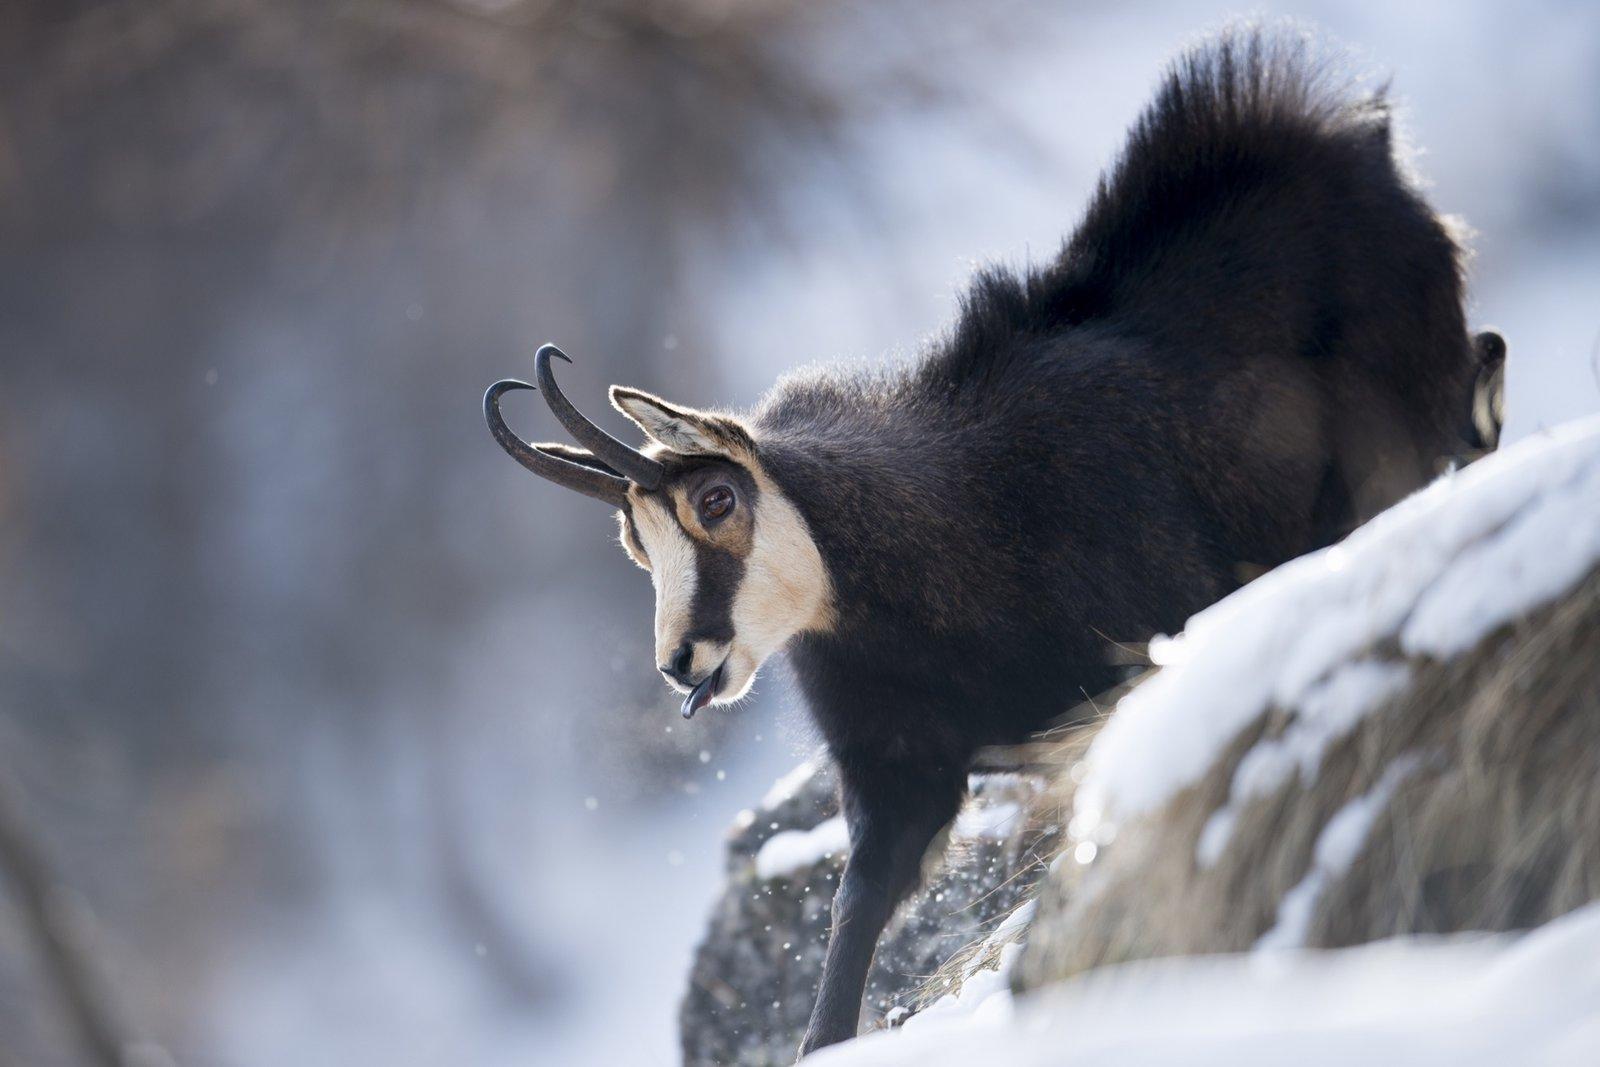 #alpinemodern #wildpresence #italianalps Photo by Martin Dellicour  Wild Presence by Alpine Modern